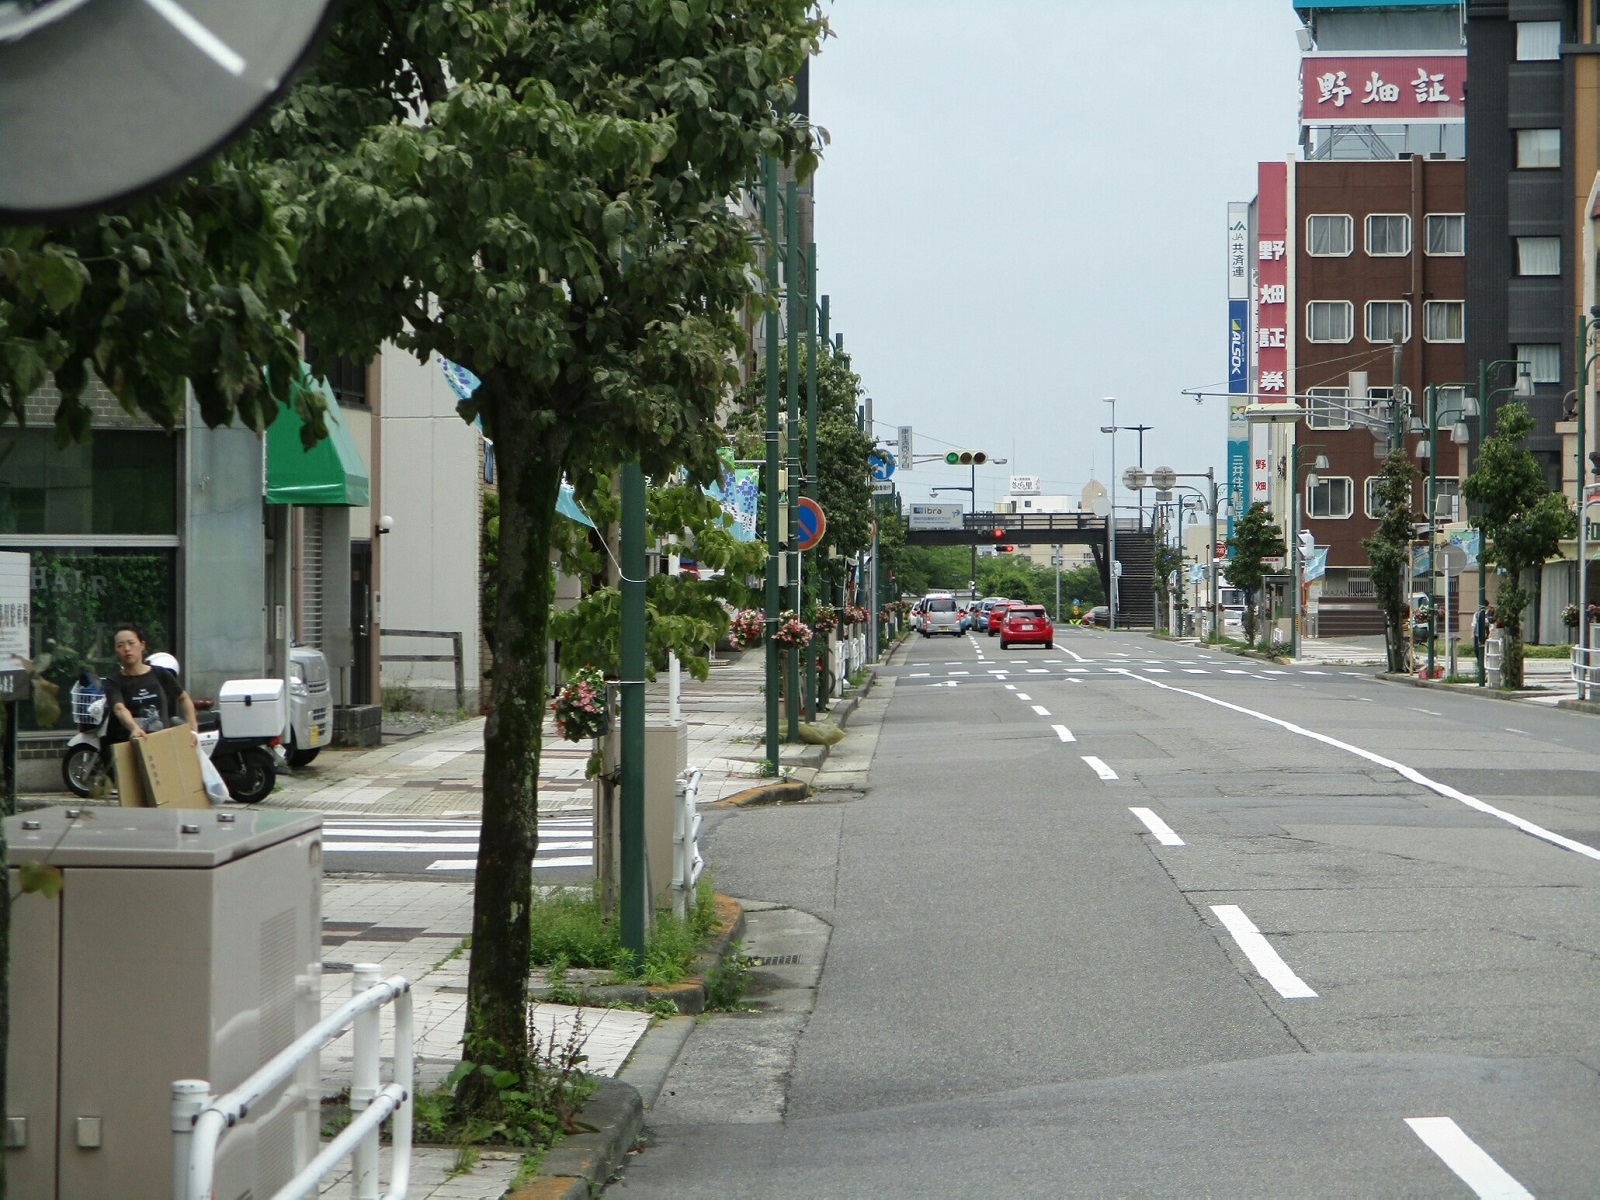 2018.6.21 (19) JRあんじょうえきいきバス - 康生町バス停 1600-1200